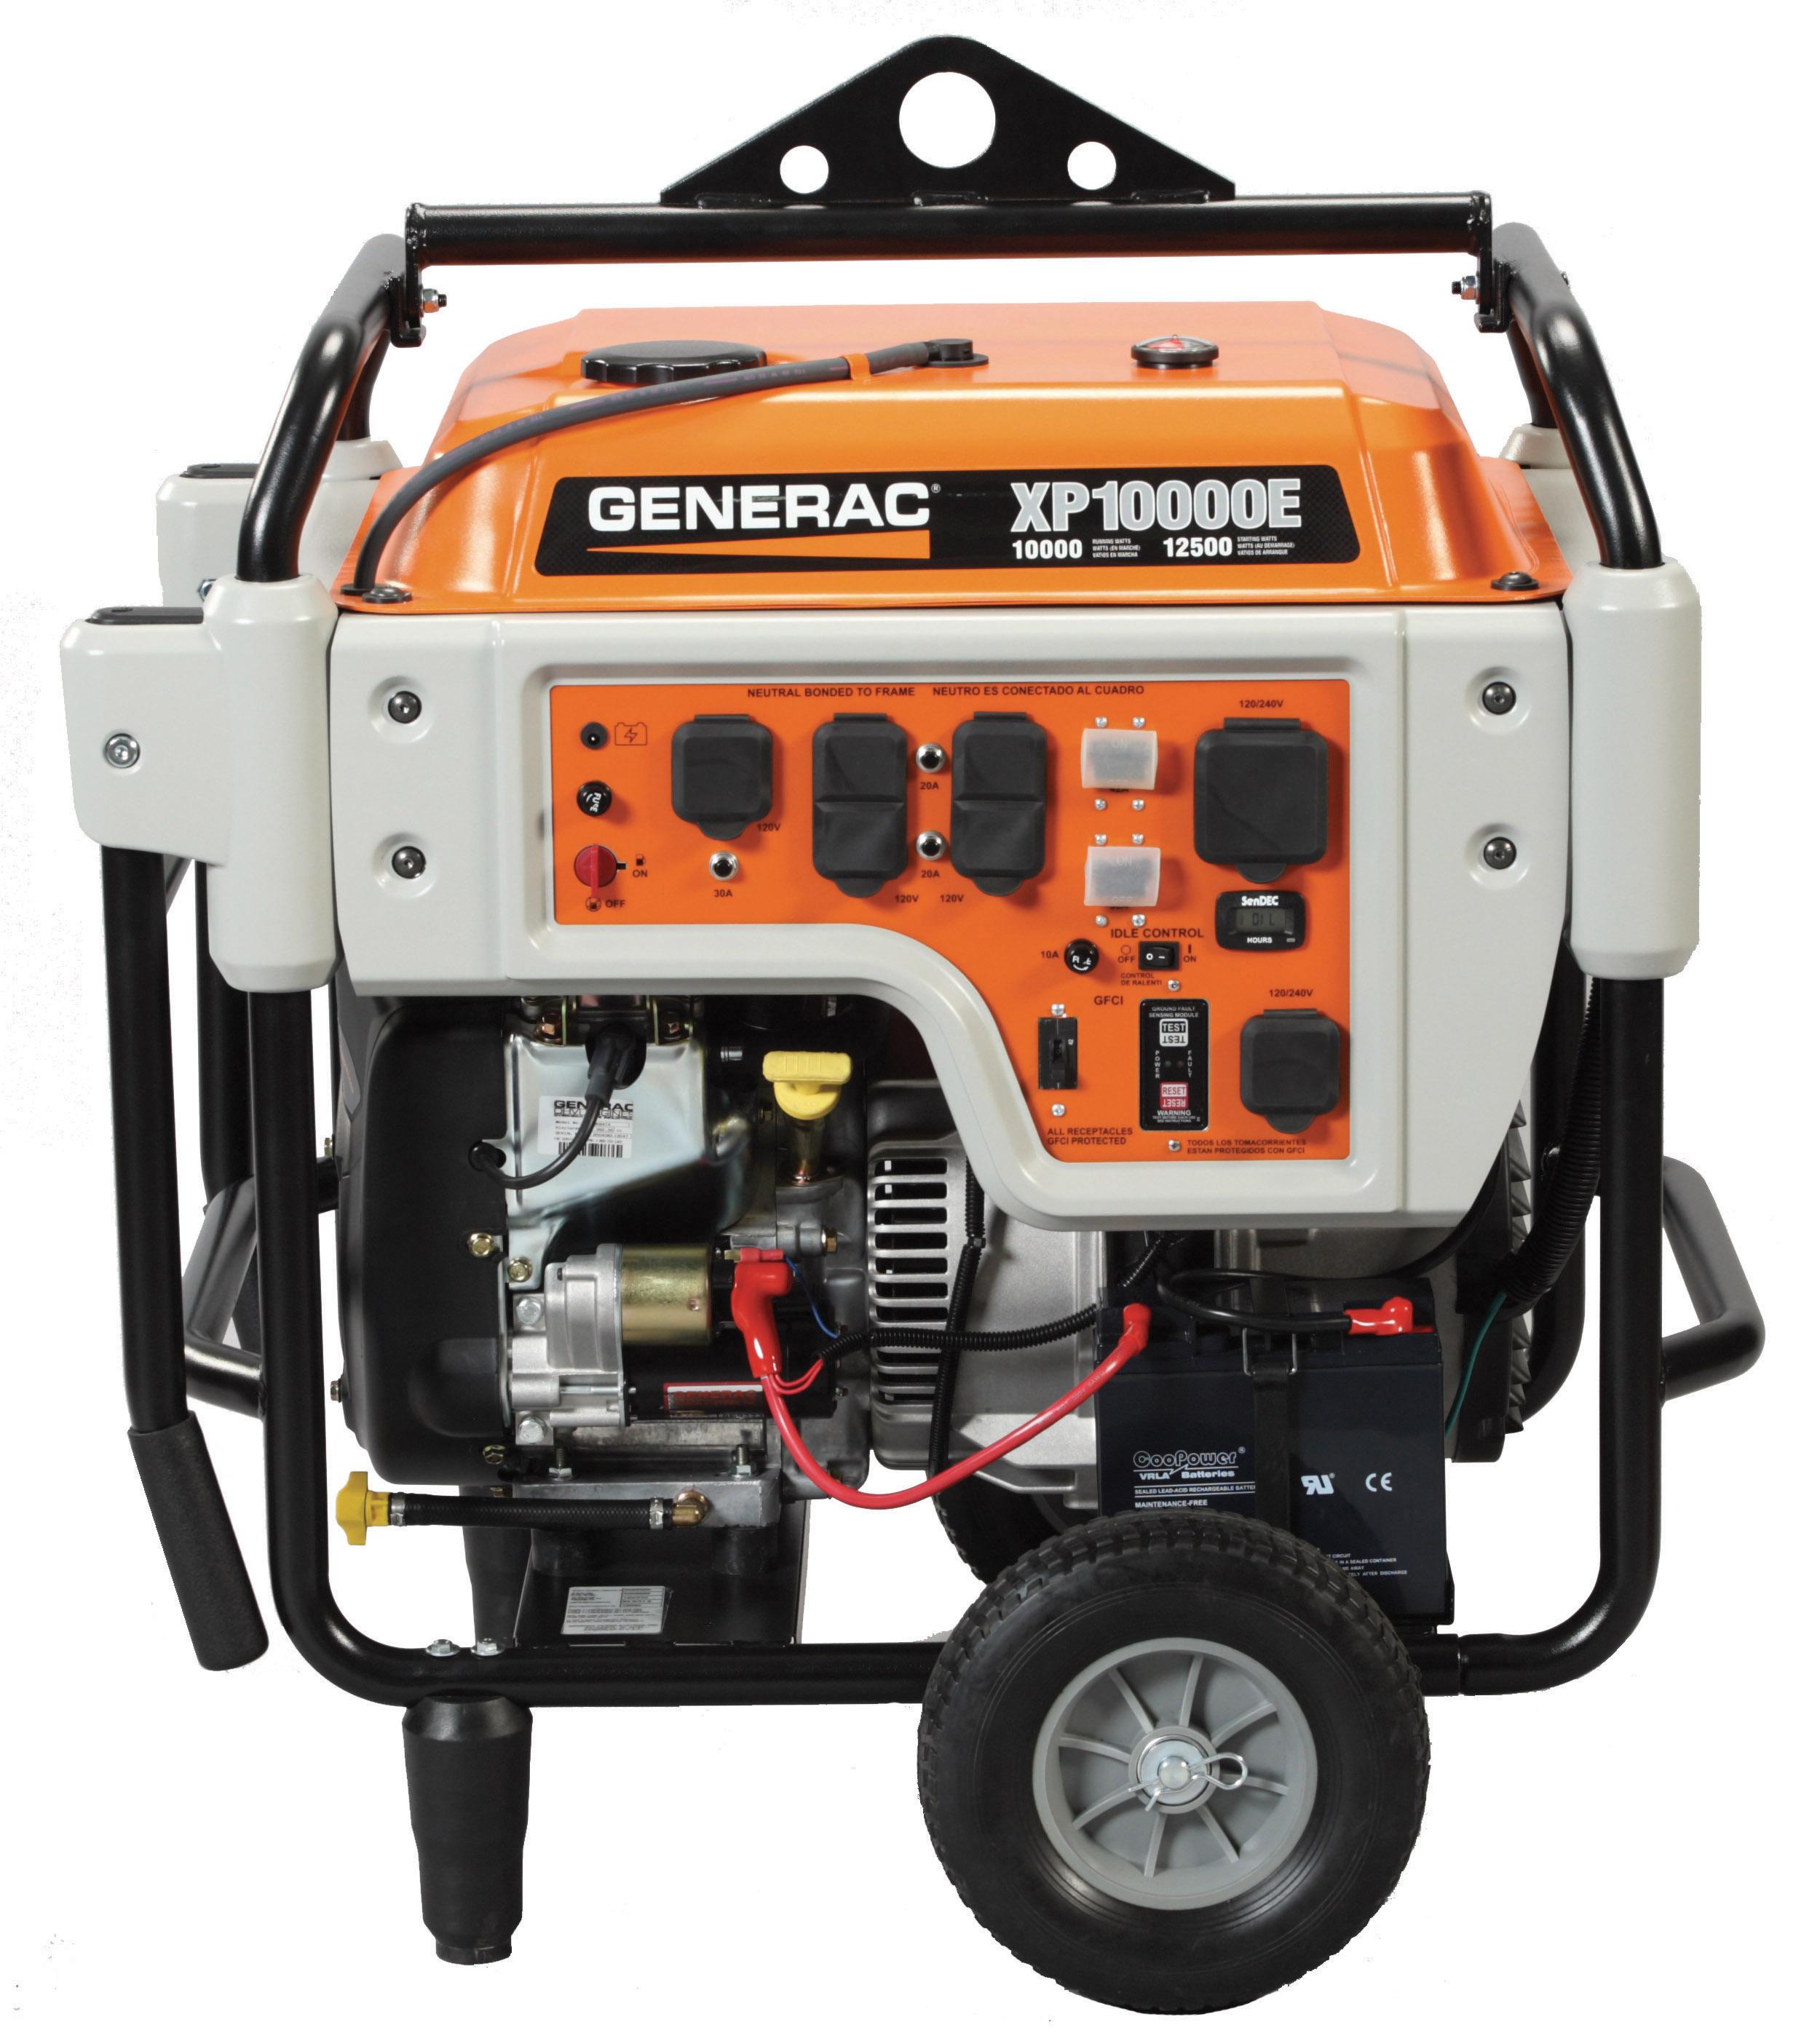 Cramers Mower & Small Engine Repair